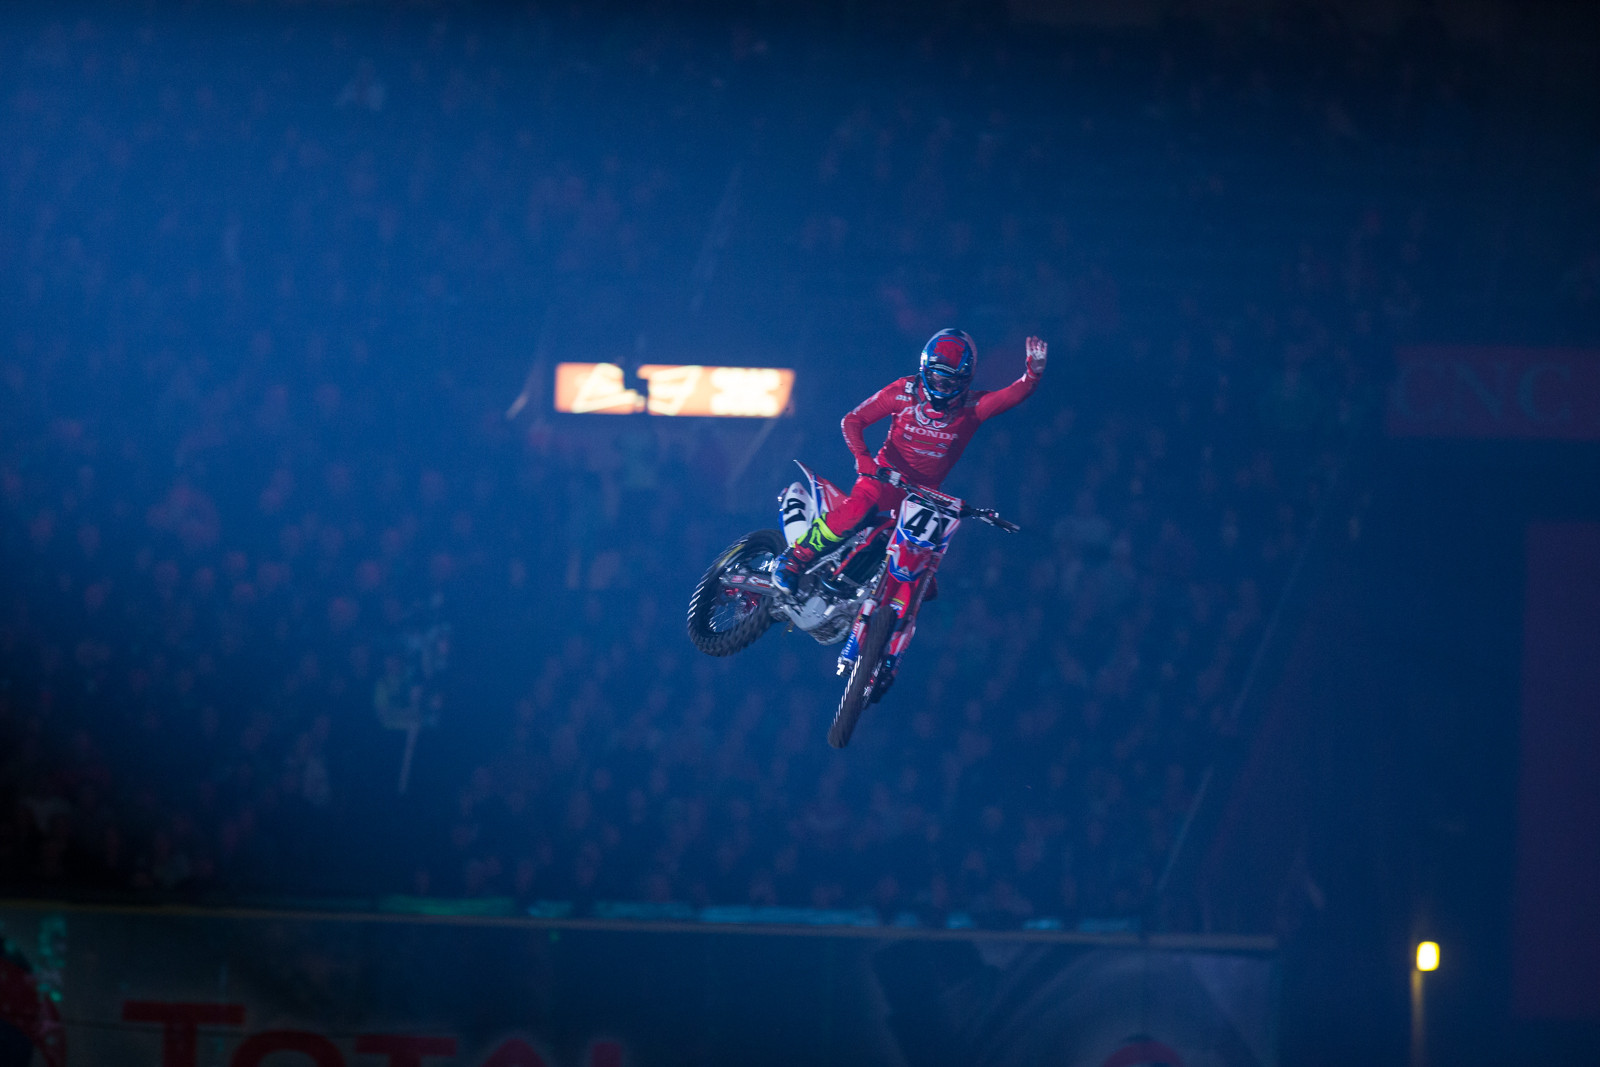 Trey Canard - Vital MX Pit Bits: Anaheim 1 - Motocross Pictures - Vital MX